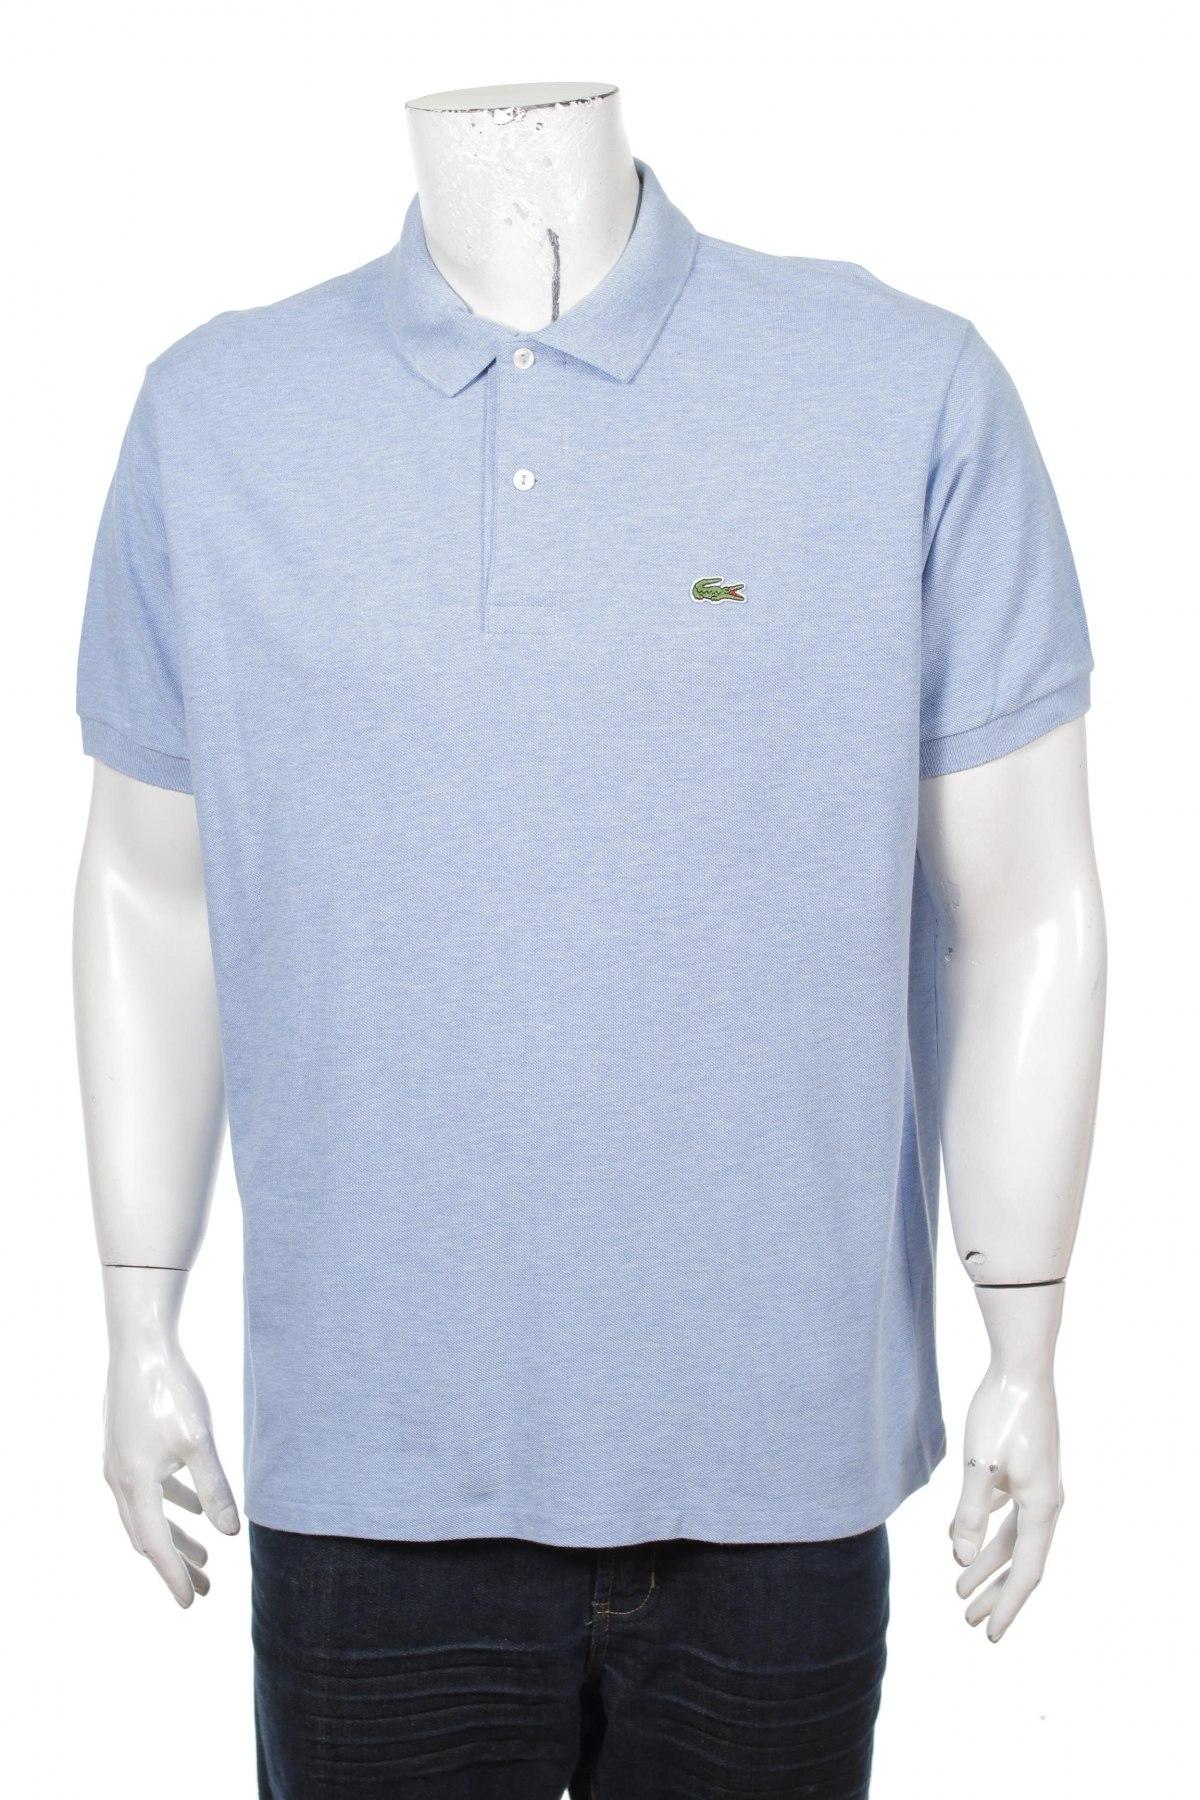 e7115ec9c70c Ανδρικό t-shirt Lacoste - σε συμφέρουσα τιμή στο Remix -  8253680